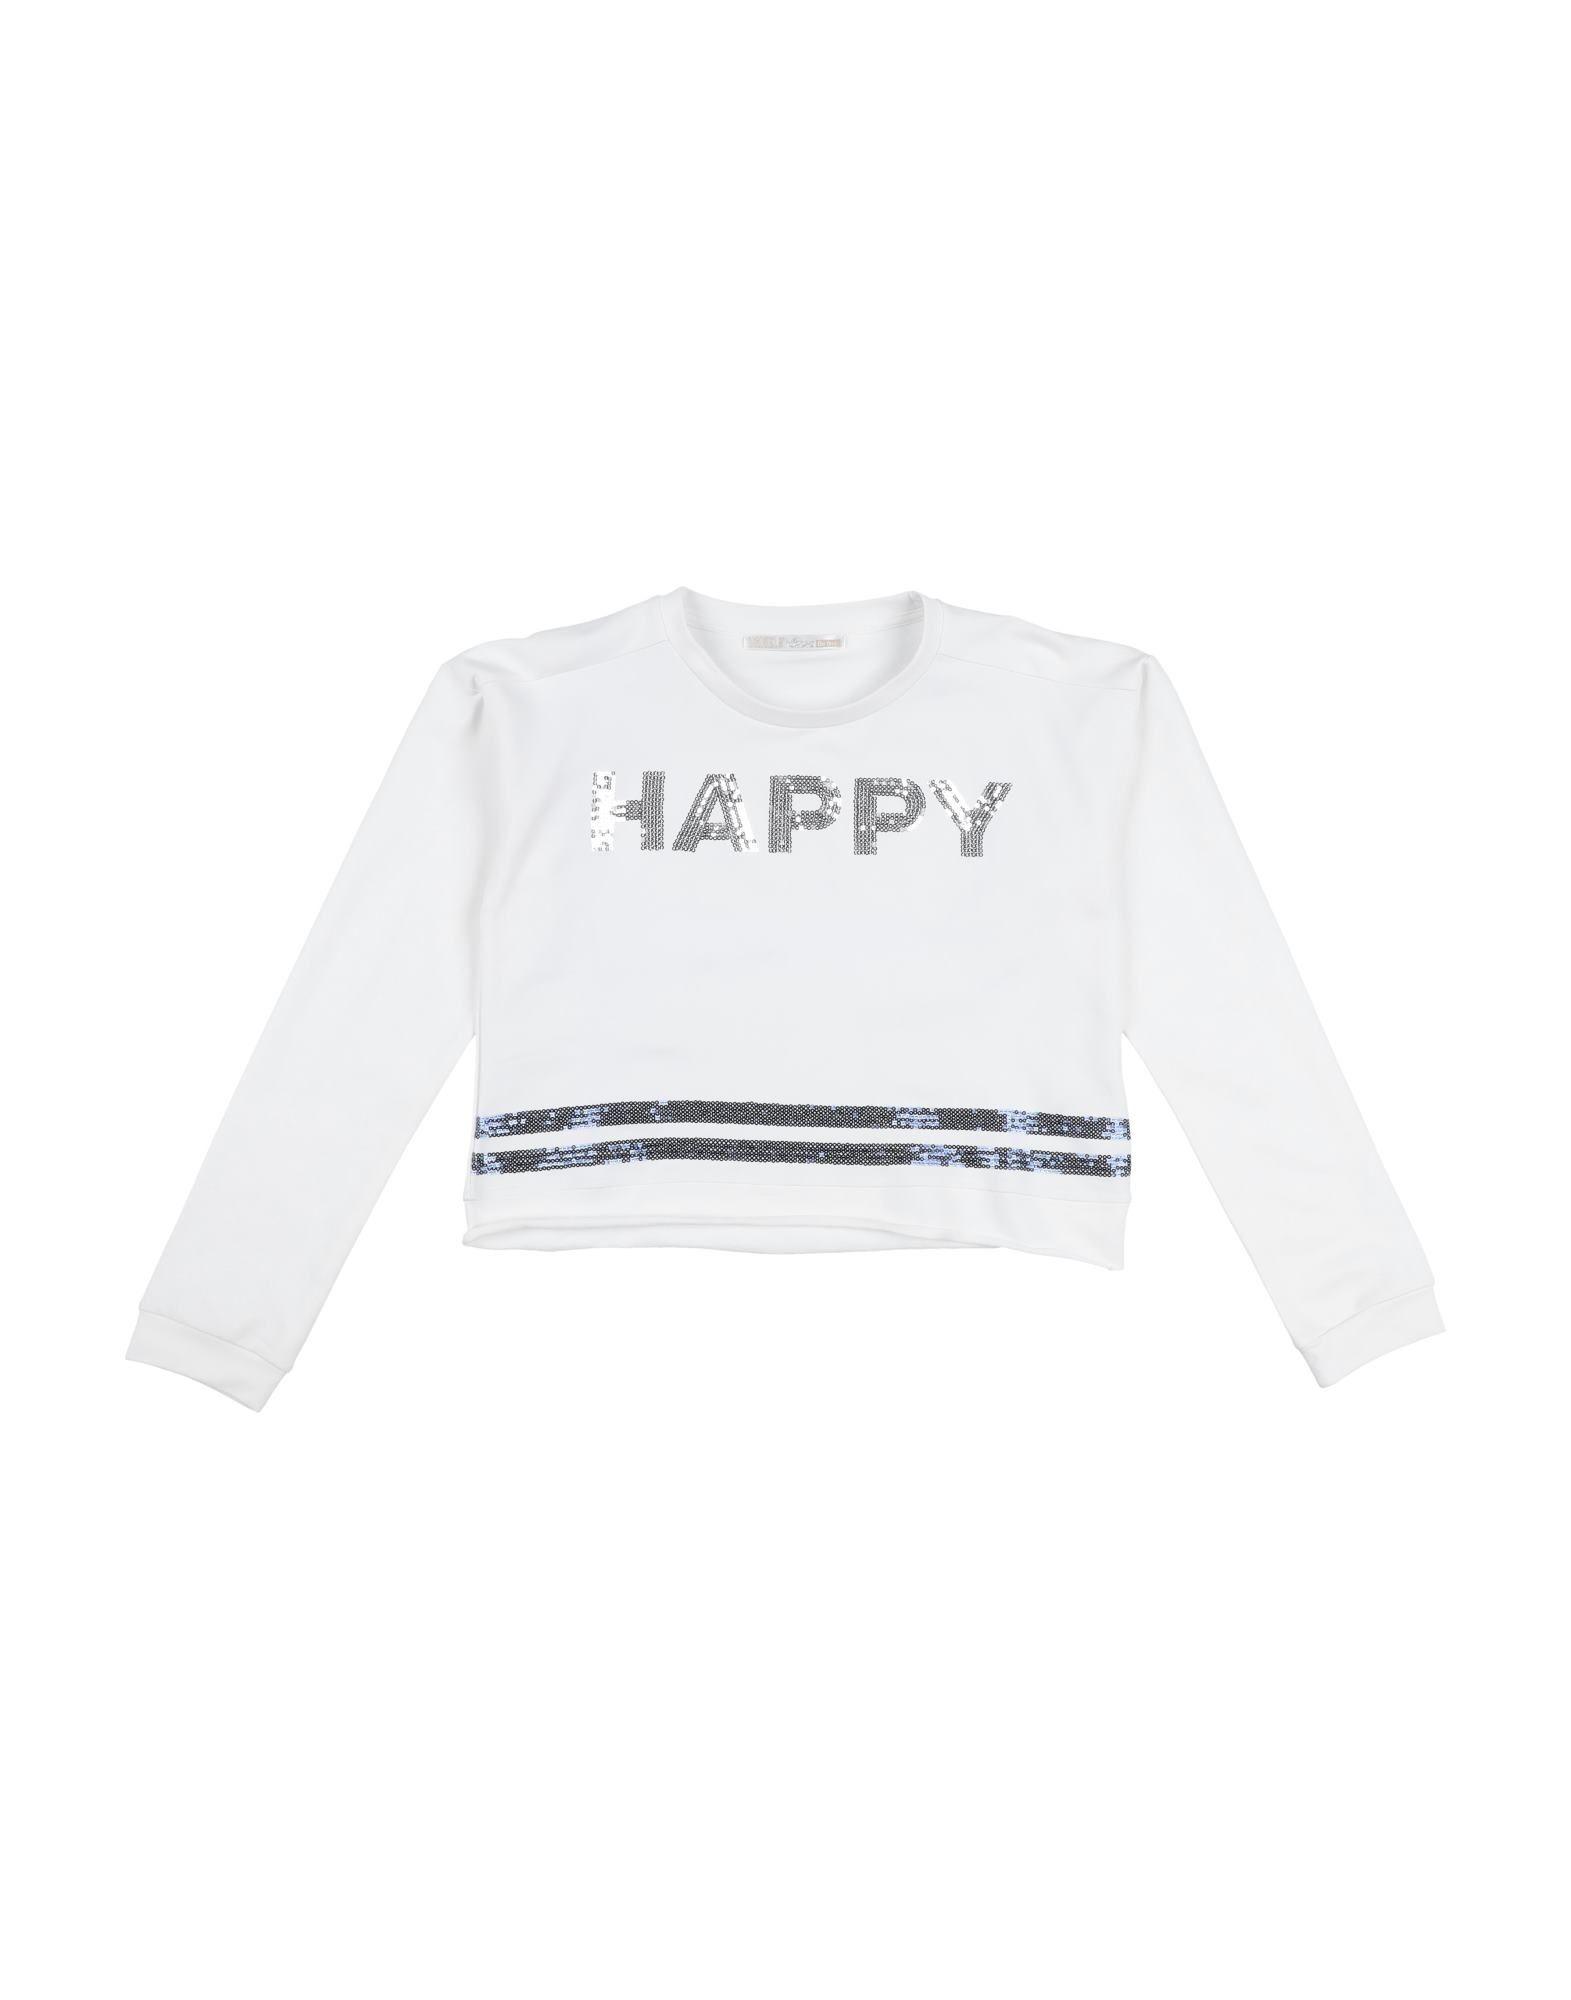 Take-two Teen Kids' Sweatshirts In White